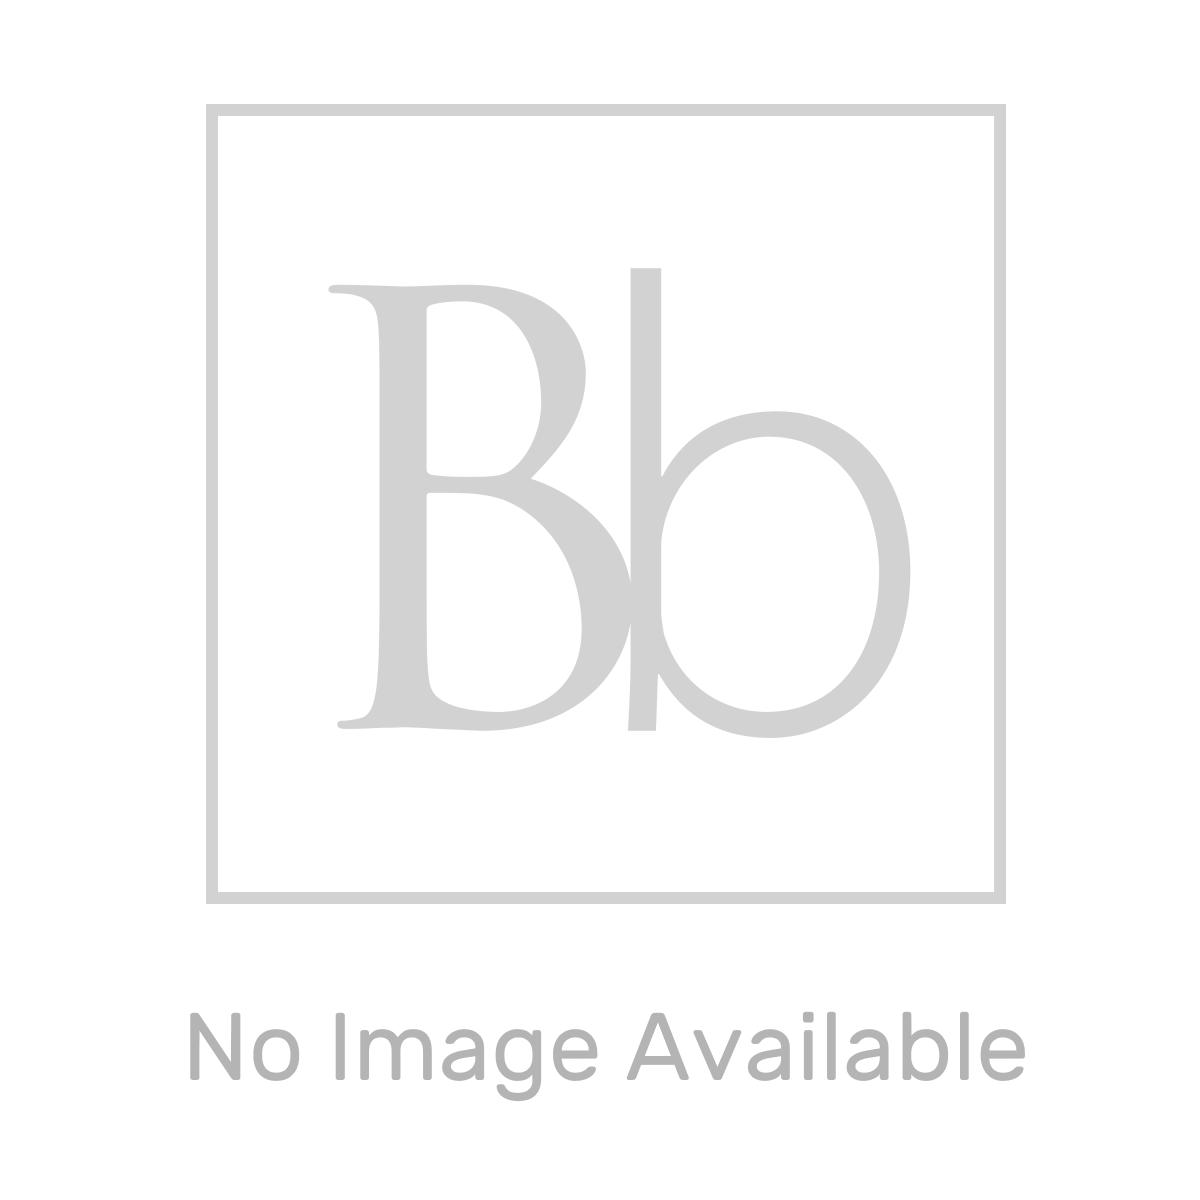 Aquadart Rolla 8 Sliding Shower Door with Side Panel Configuration